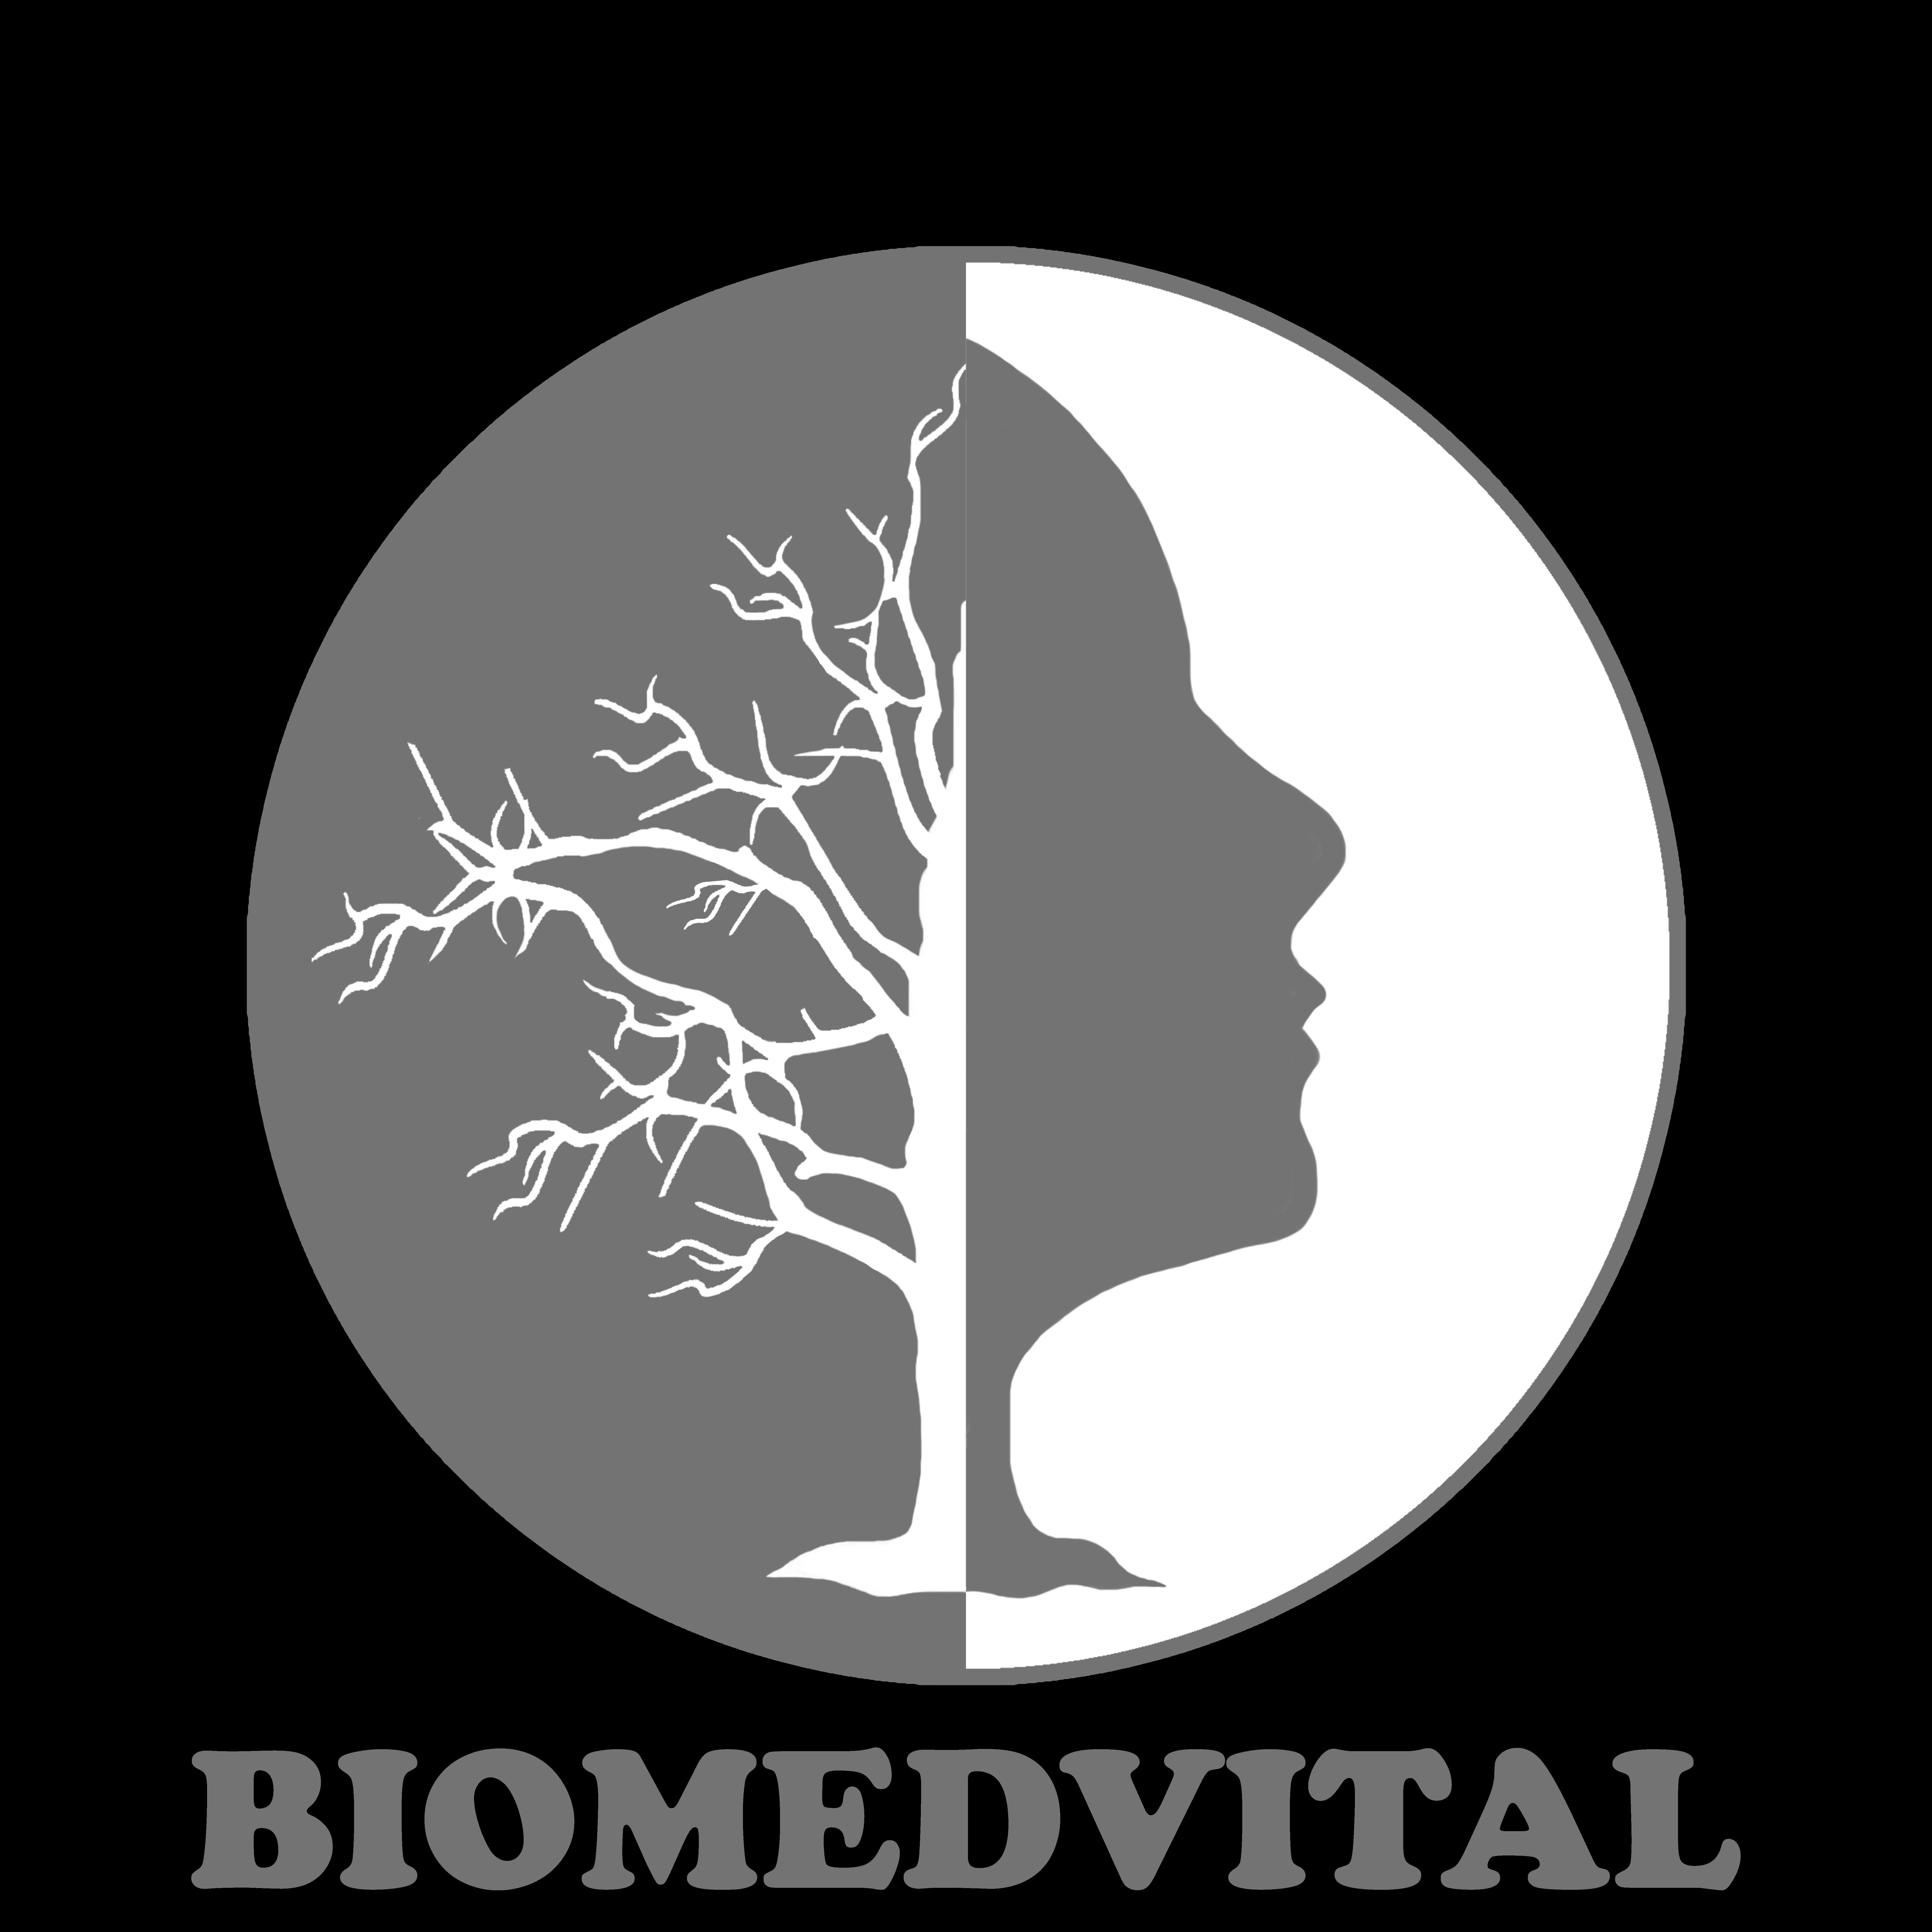 BIOMEDVITAL logo